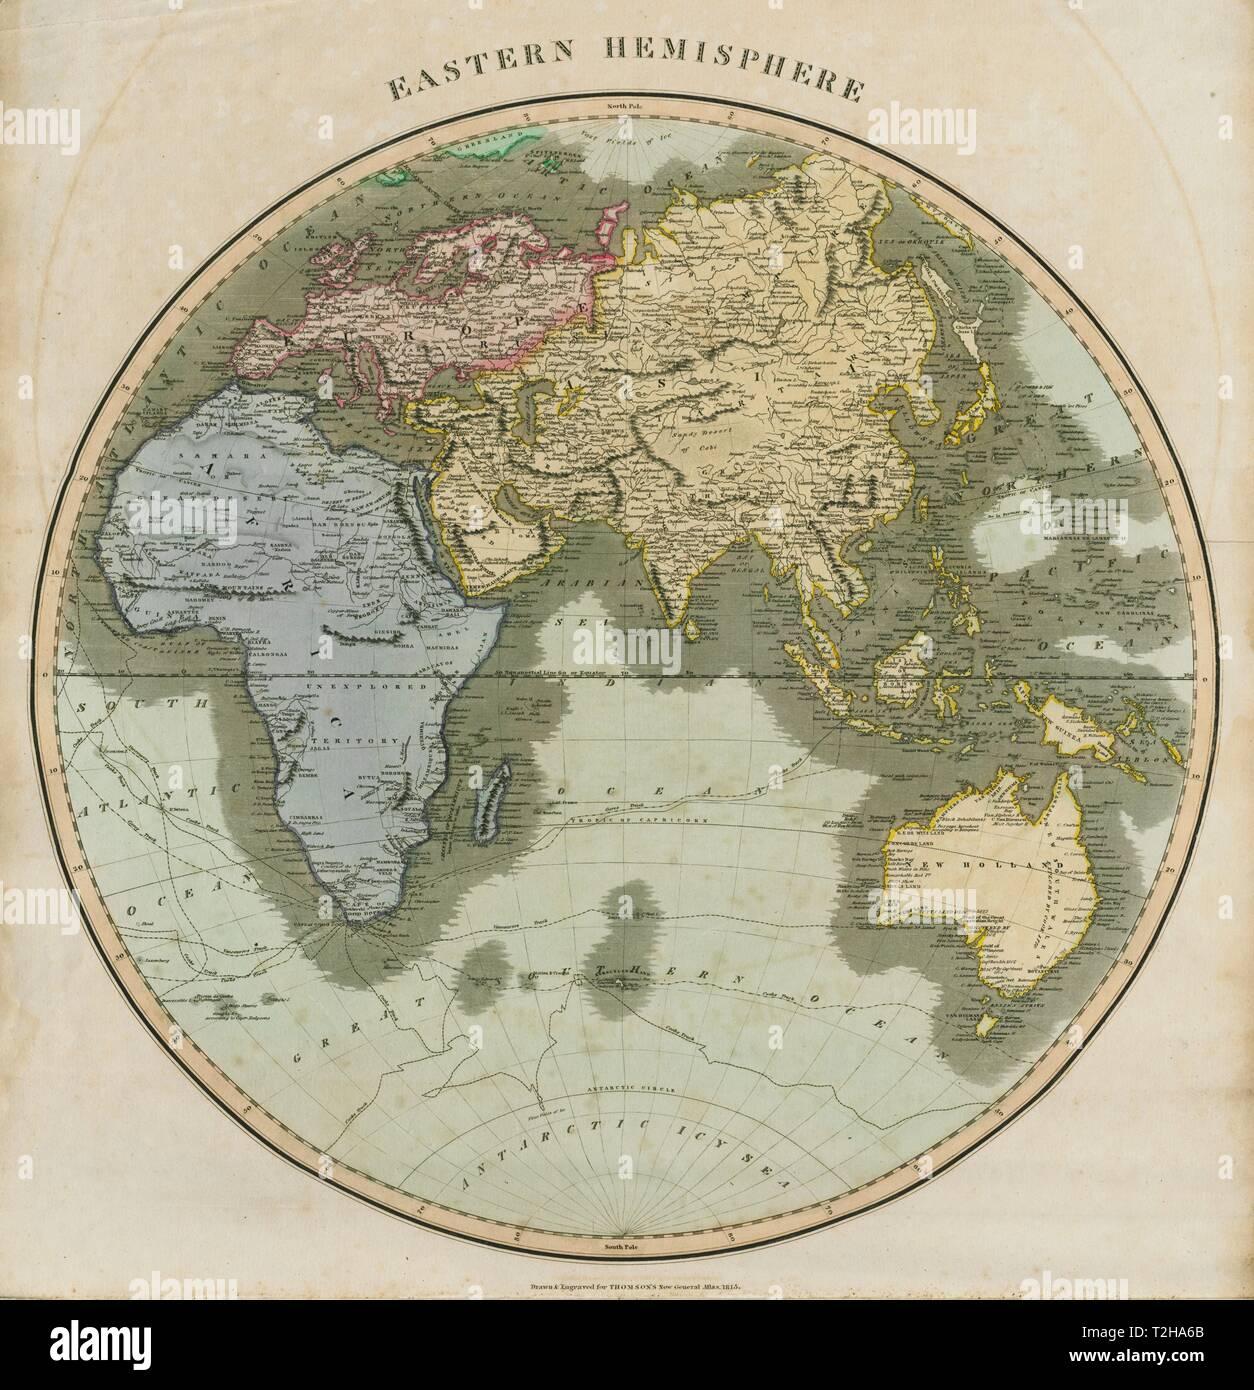 Map Of Africa Asia And Europe.Eastern Hemisphere Europe Africa Asia Australasia Thomson 1817